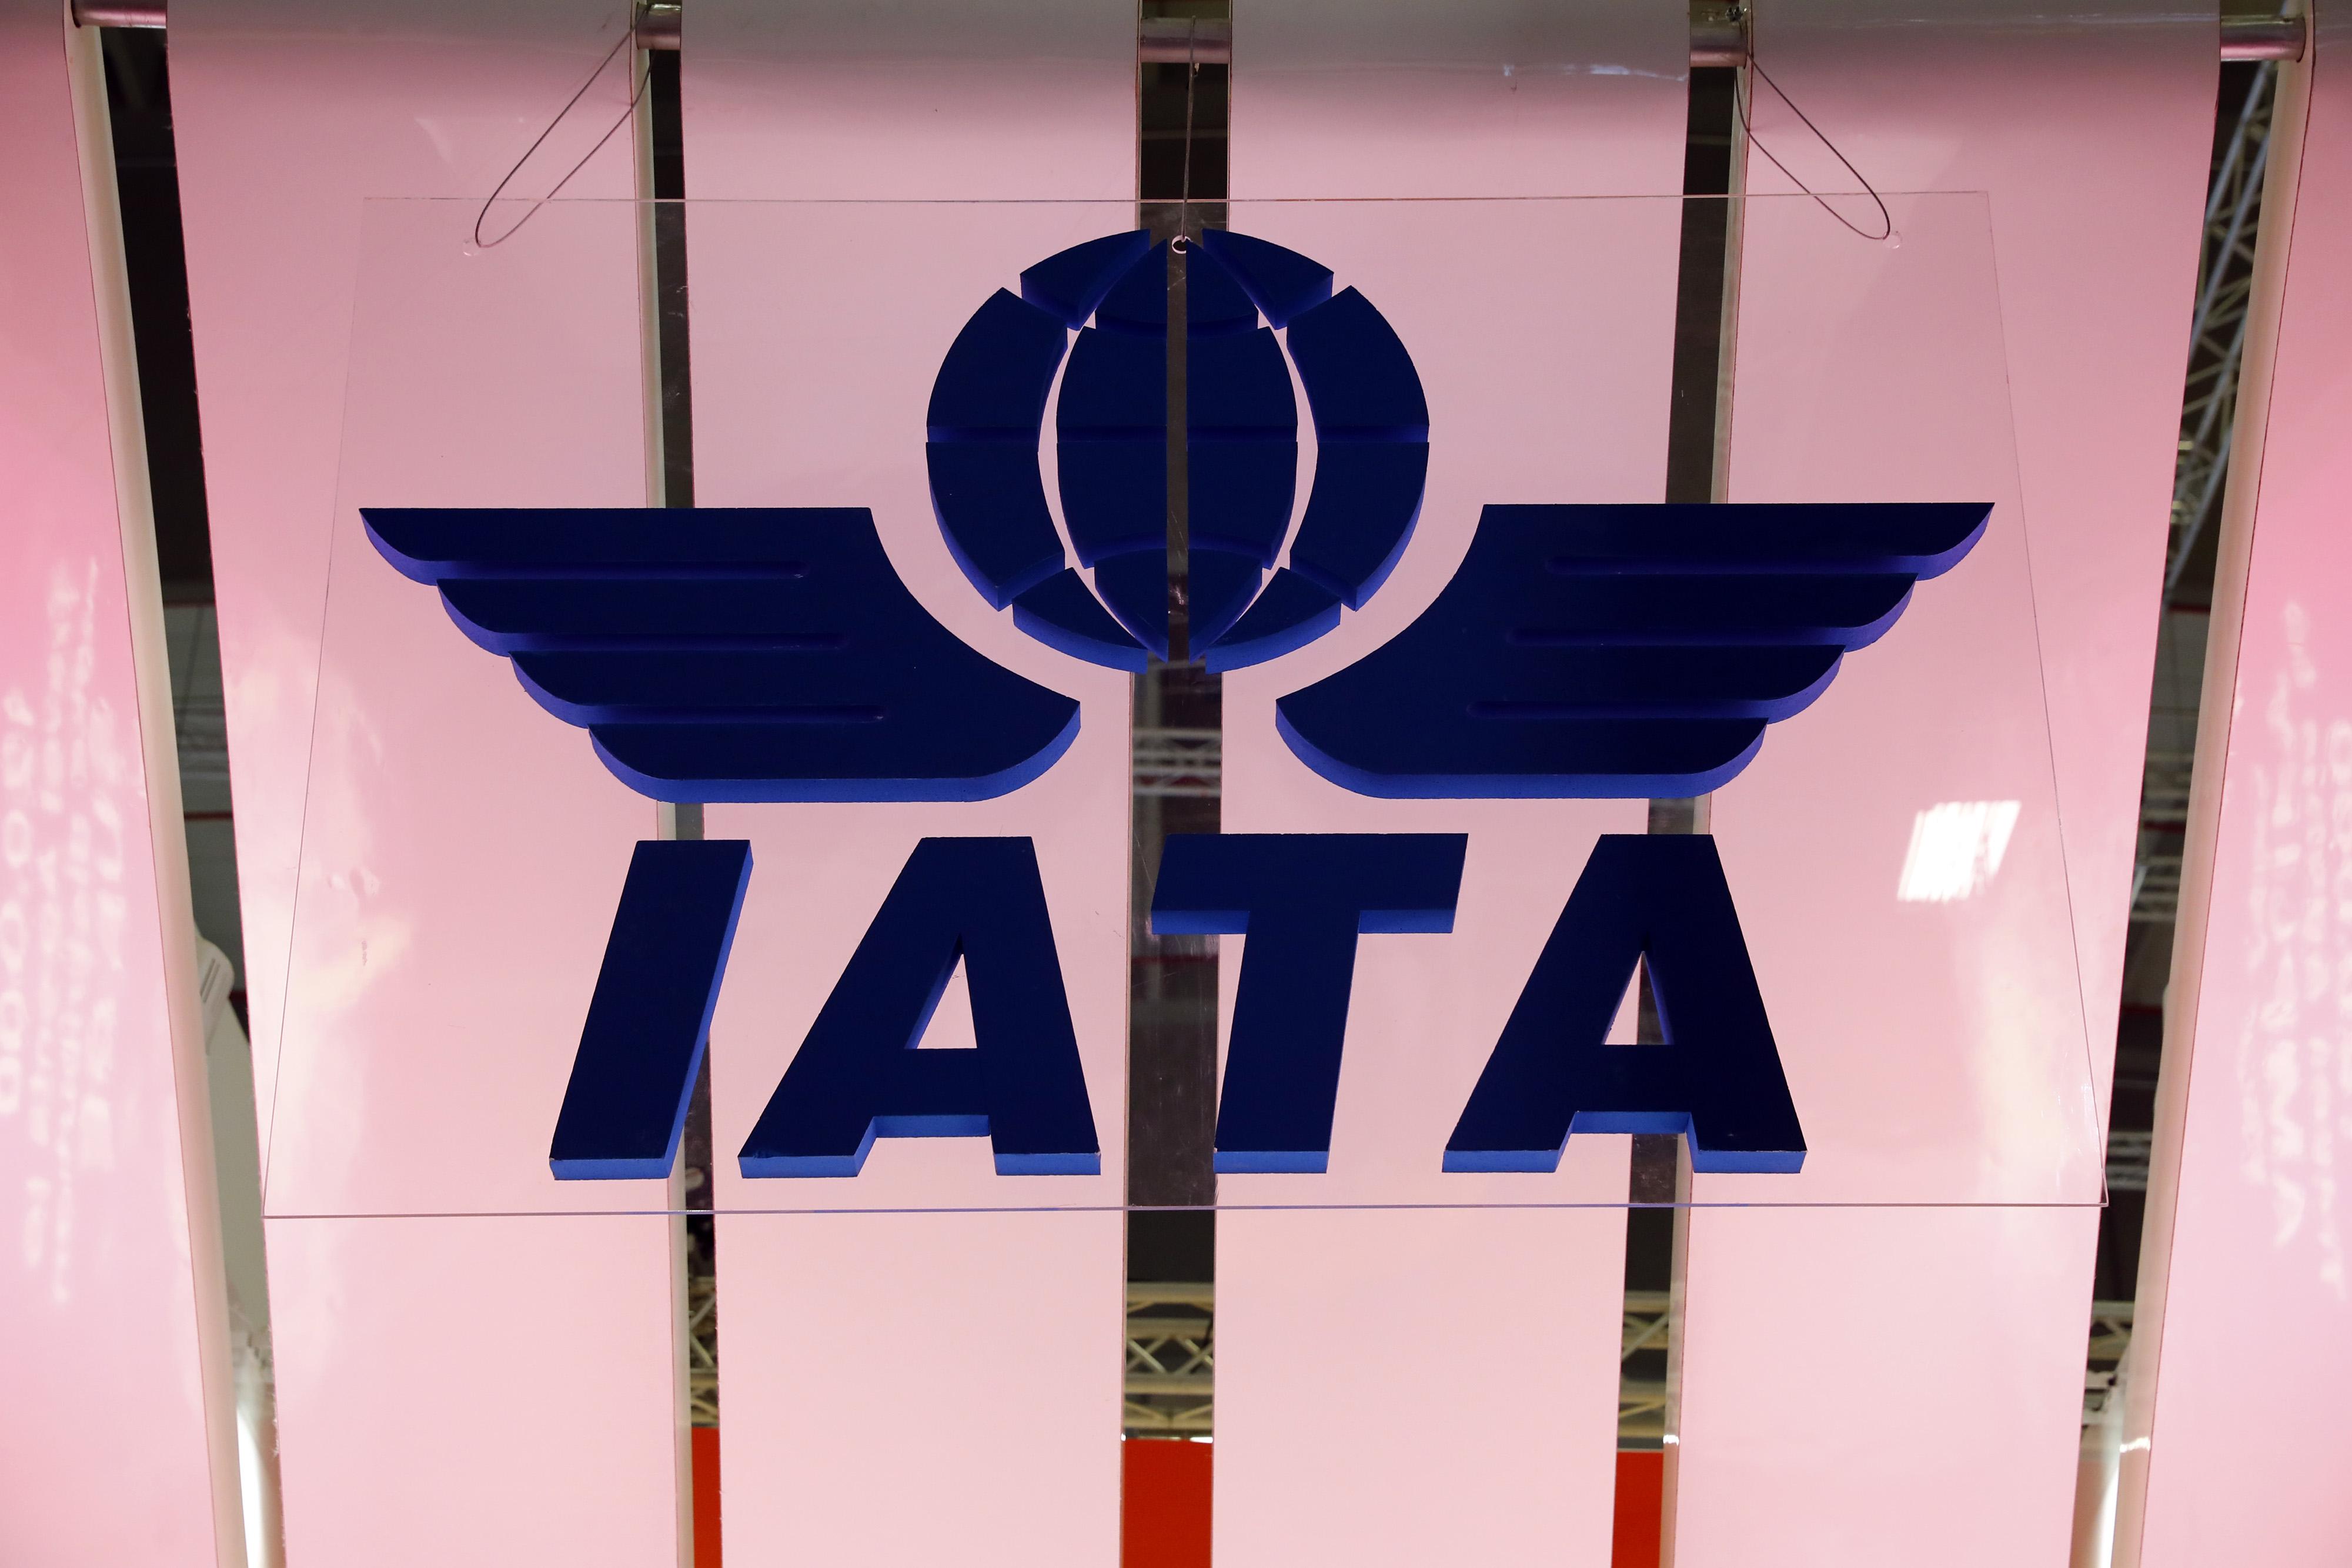 The International Air Transport Association (IATA) logo is seen at the International Tourism Trade Fair ITB in Berlin, Germany, March 7, 2018. REUTERS/Fabrizio Bensch